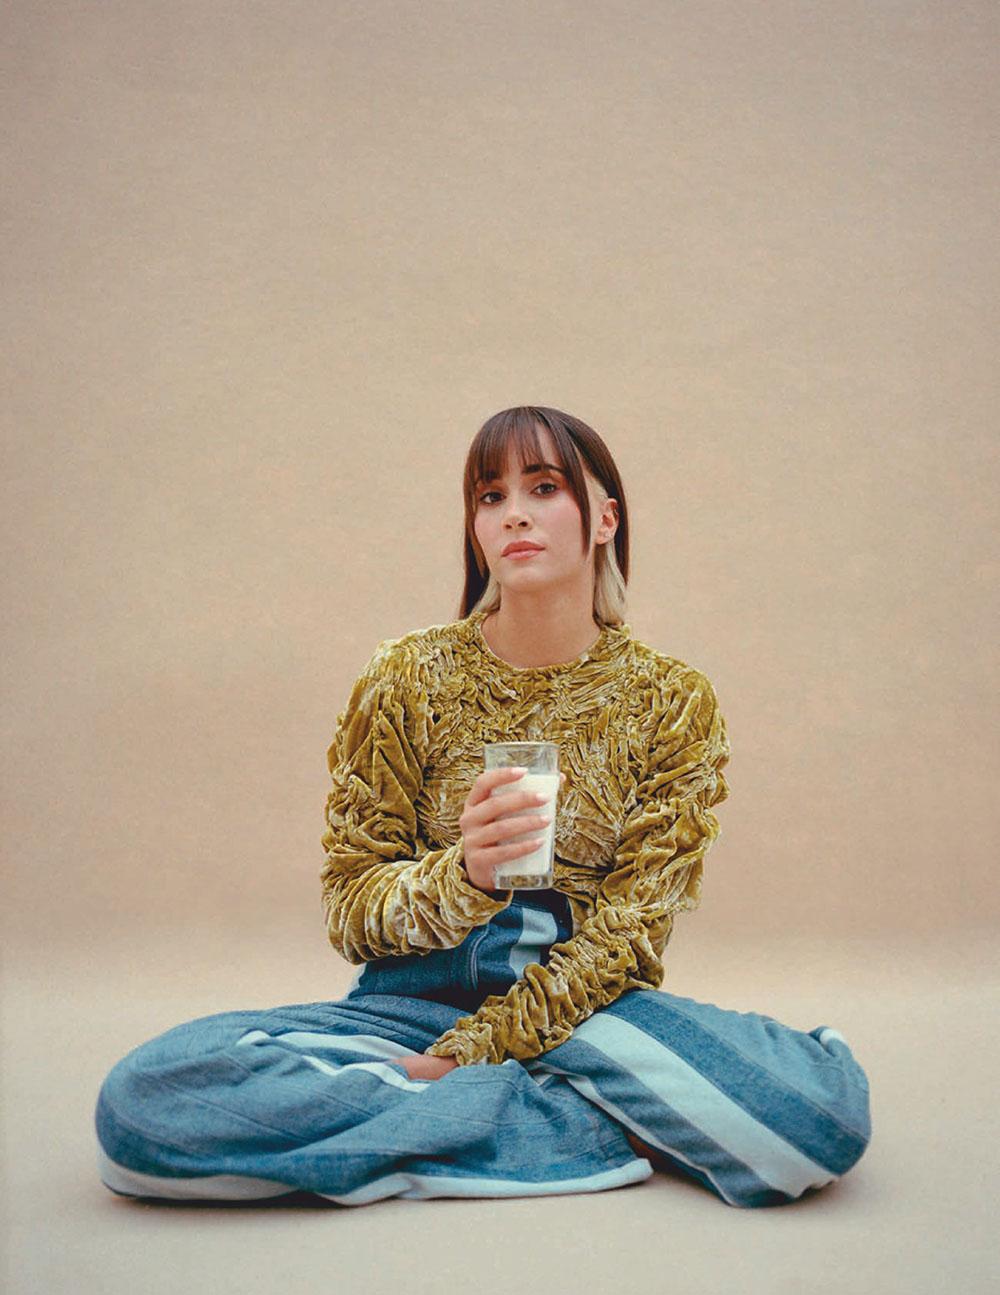 Aitana Ocaña by Pablo Zamora for Vogue Spain December 2020